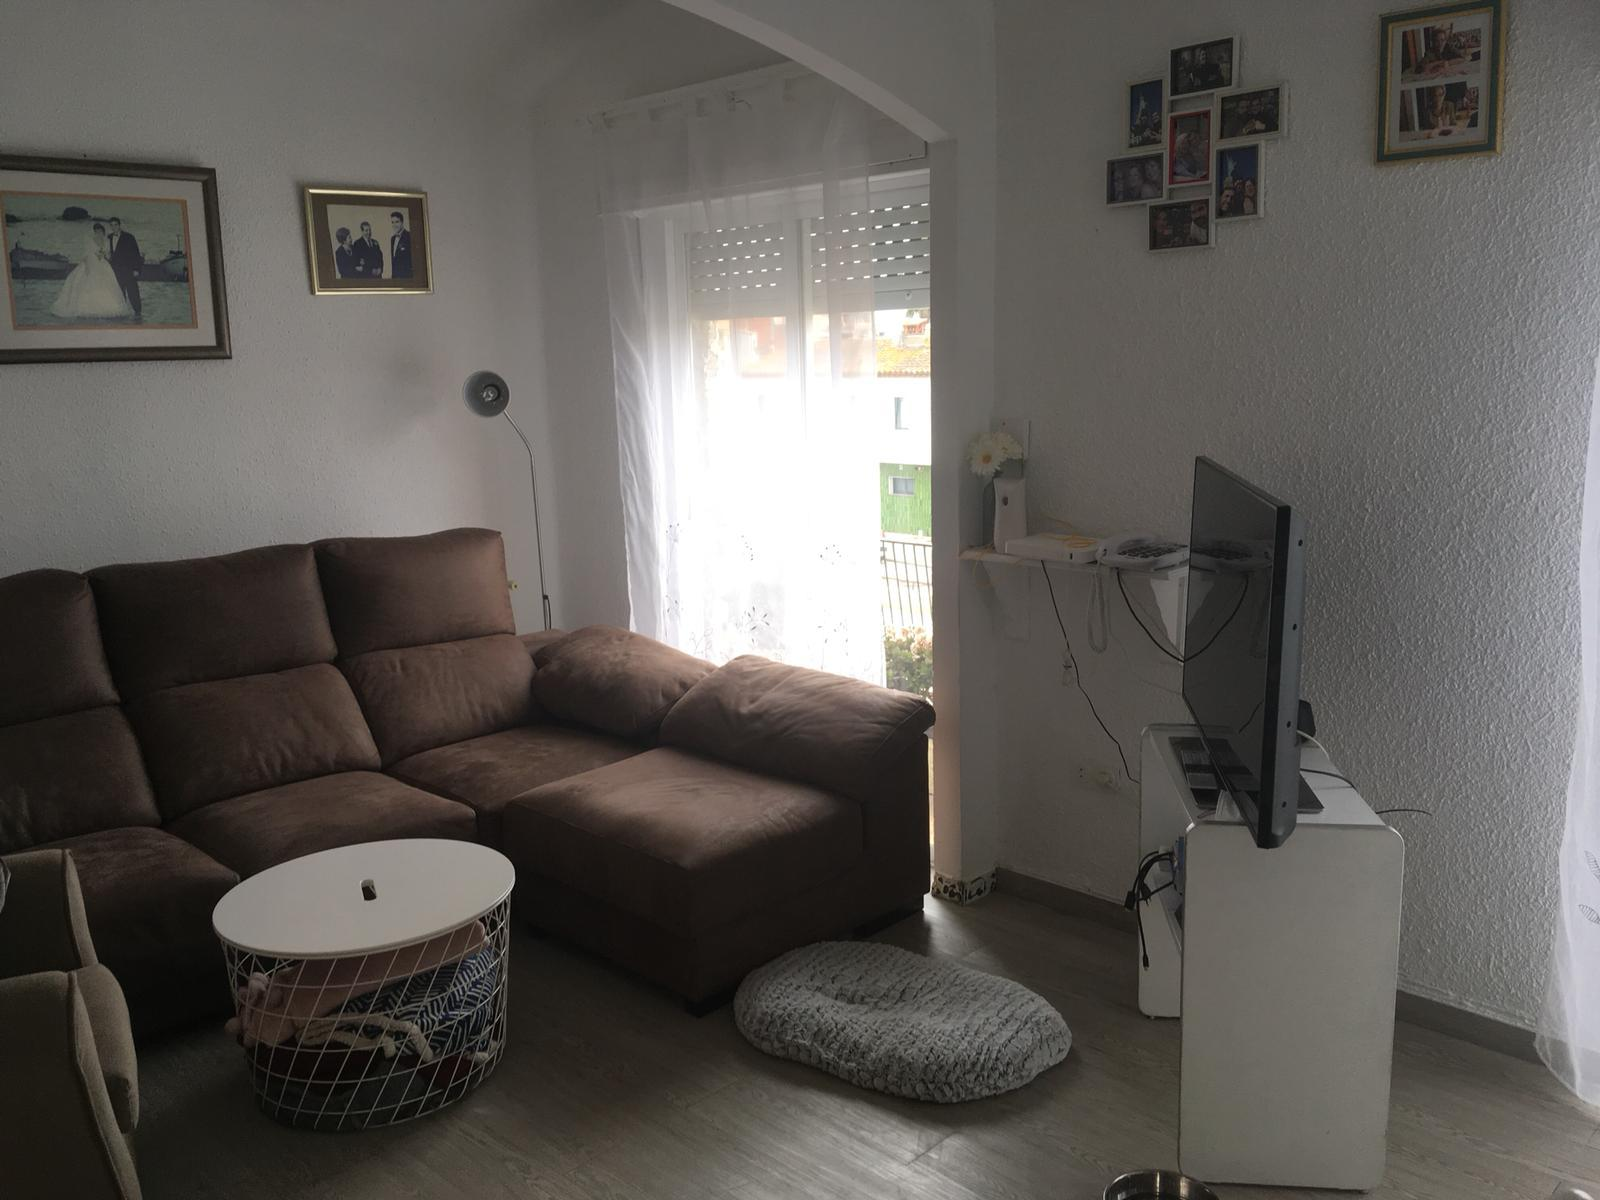 Imagen 4 Casa Adosada en venta en Palamós / Casa de 4 habitacions al costat de Hospital de Palamos